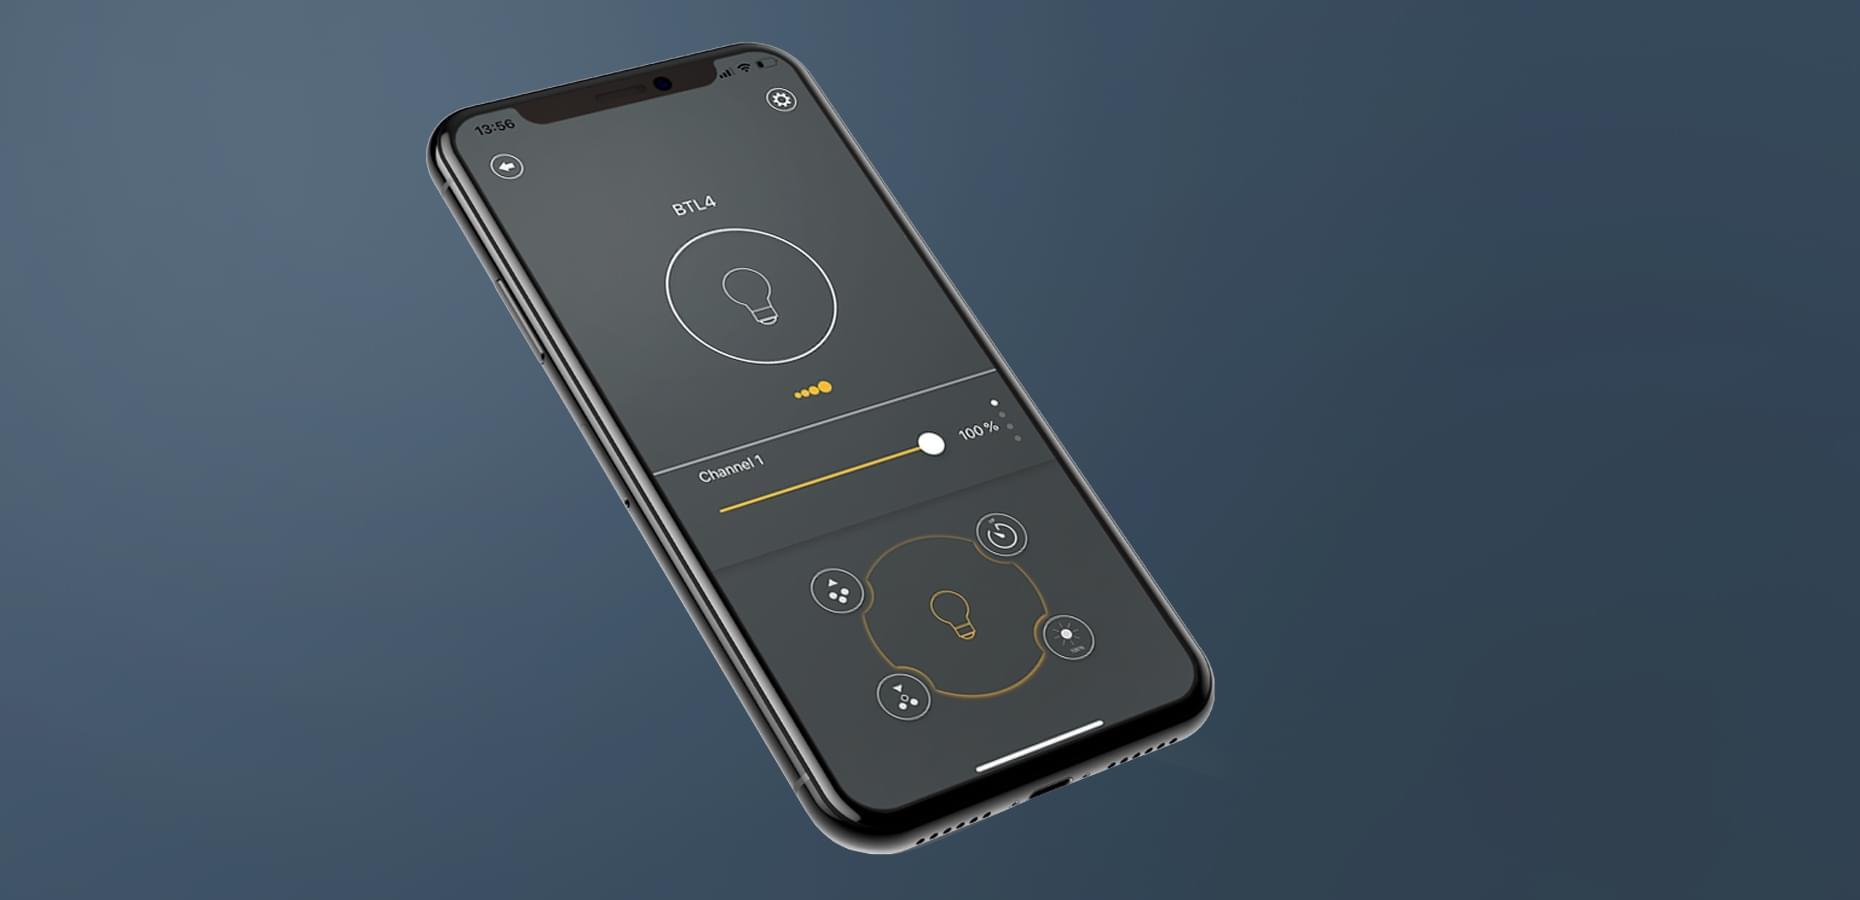 spectral_smartlight_app_2021_1860x9001631027409